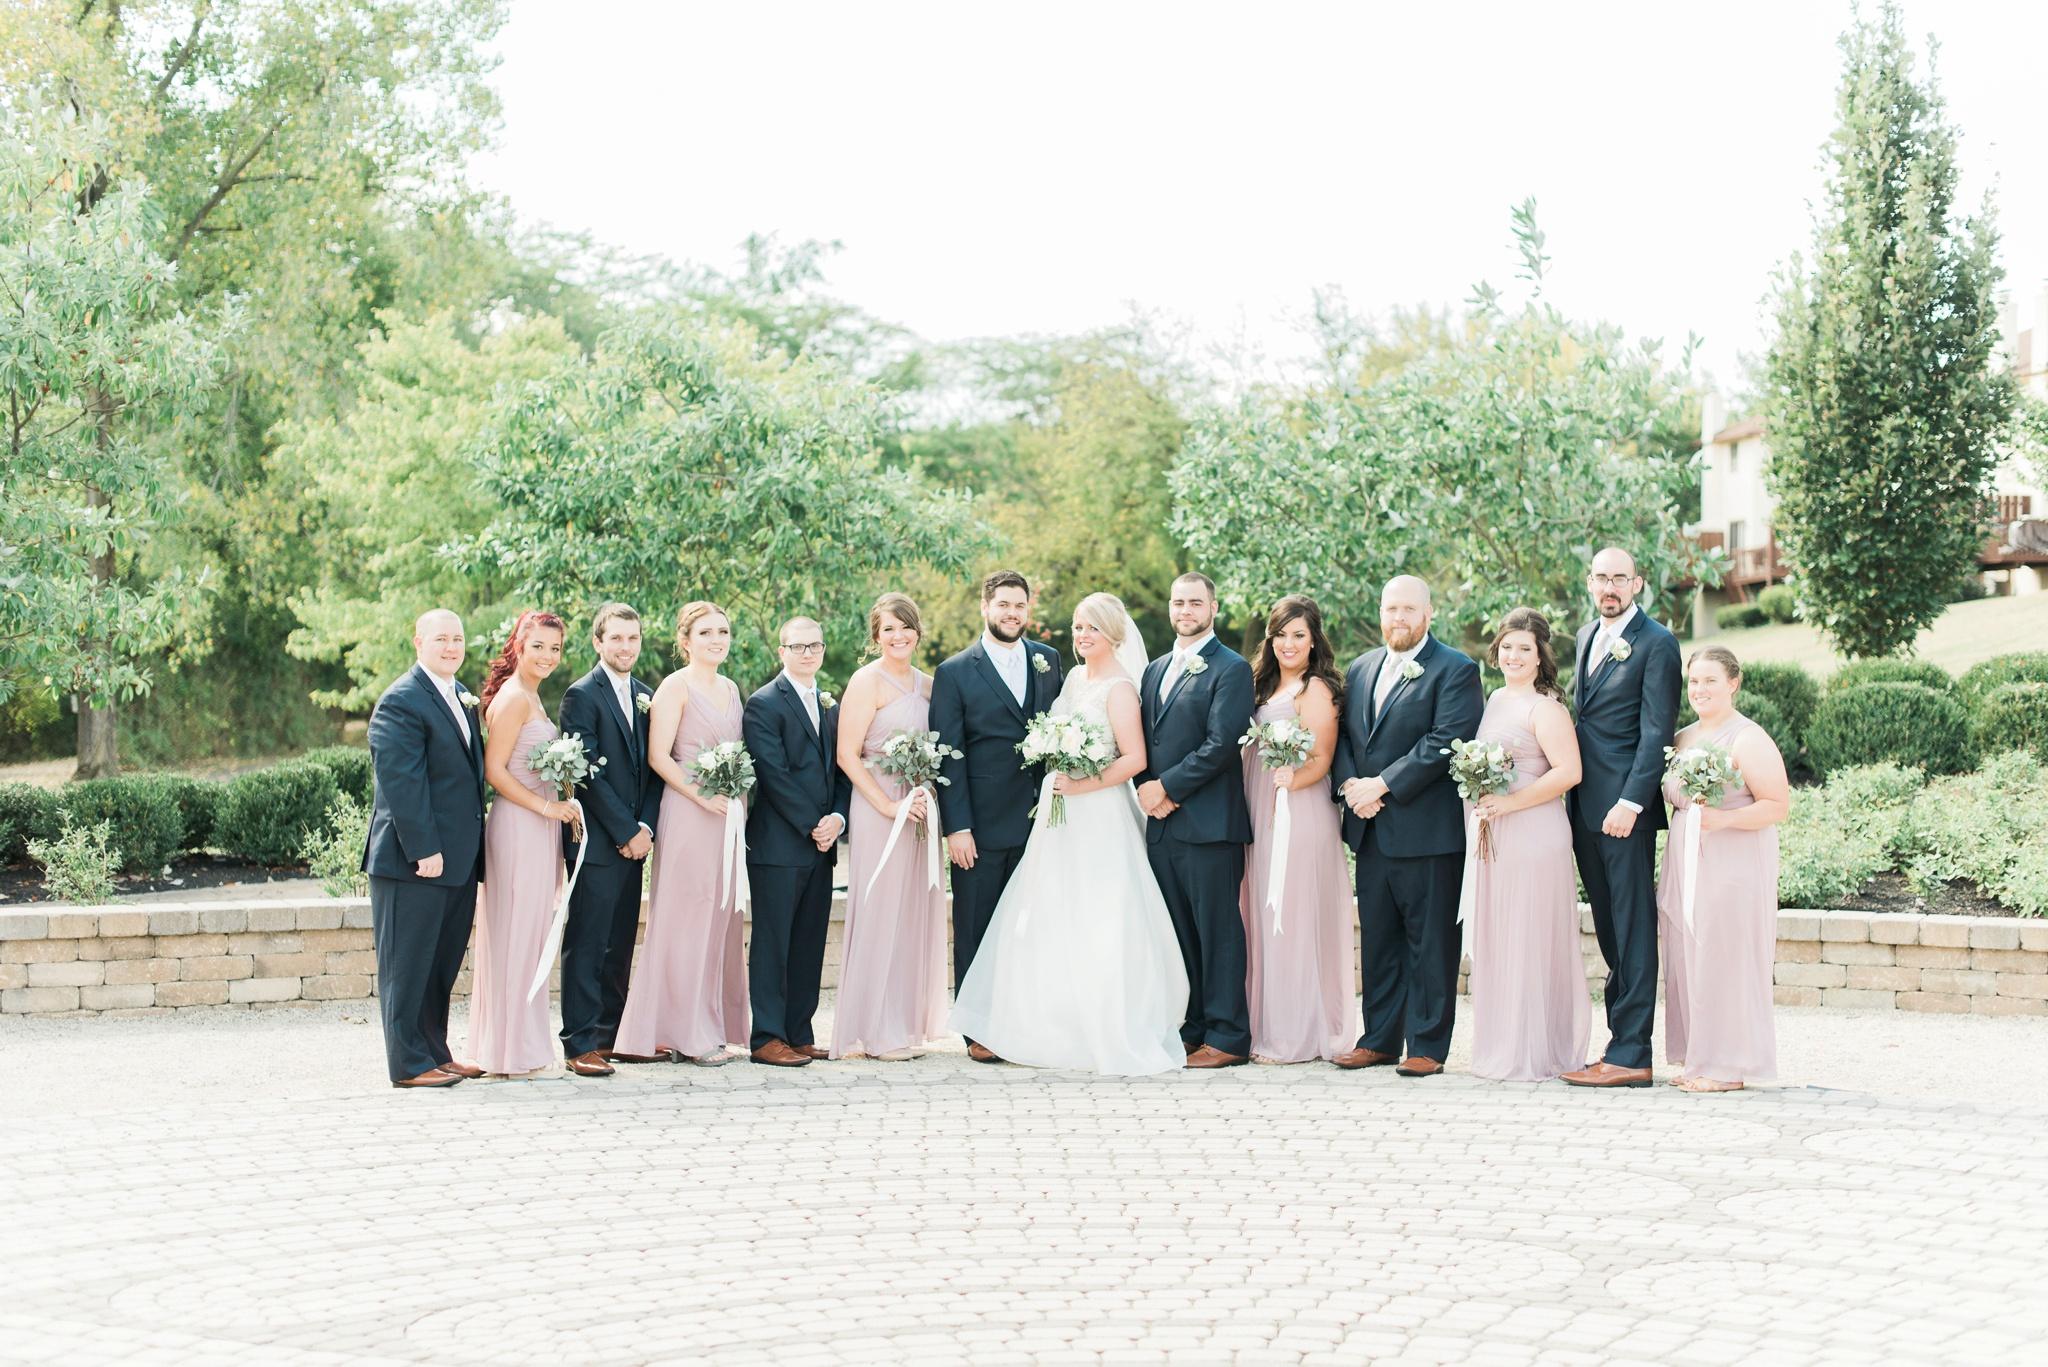 aladdin-shrine-center-wedding-grove-city-ohio-amber-jared_0058.jpg